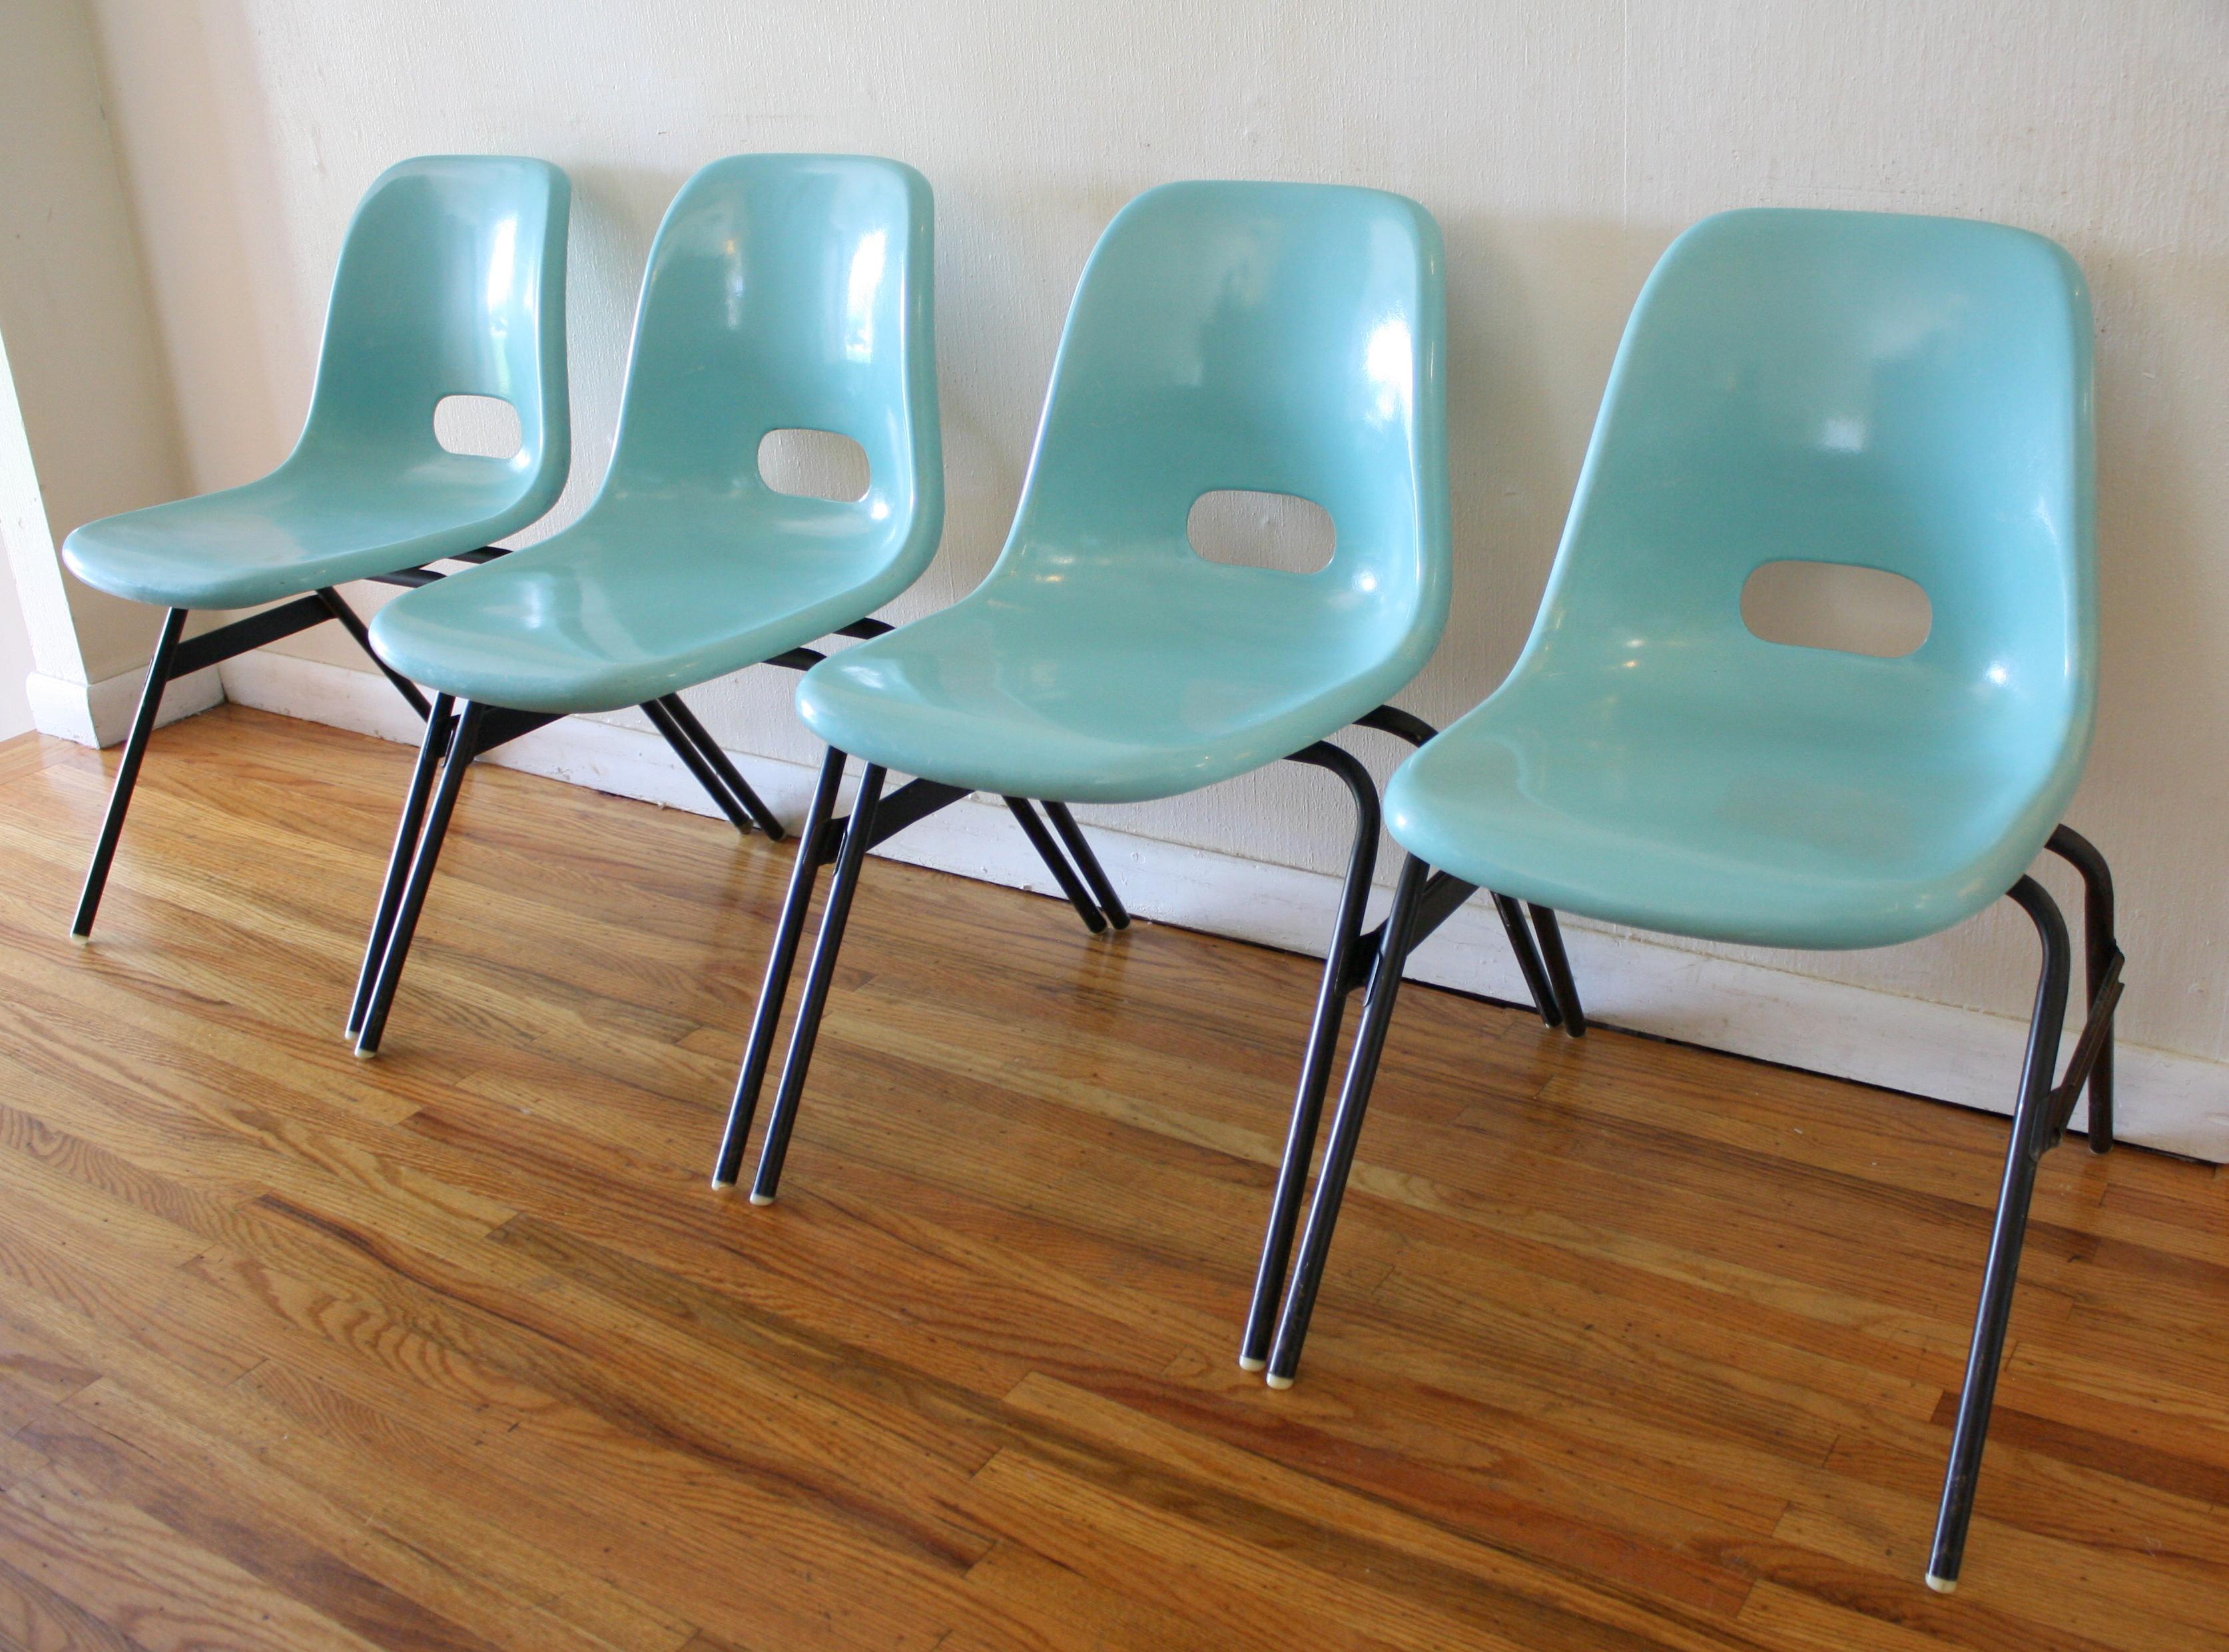 krueger folding chairs desk chair under 200 fiberglass picked vintage